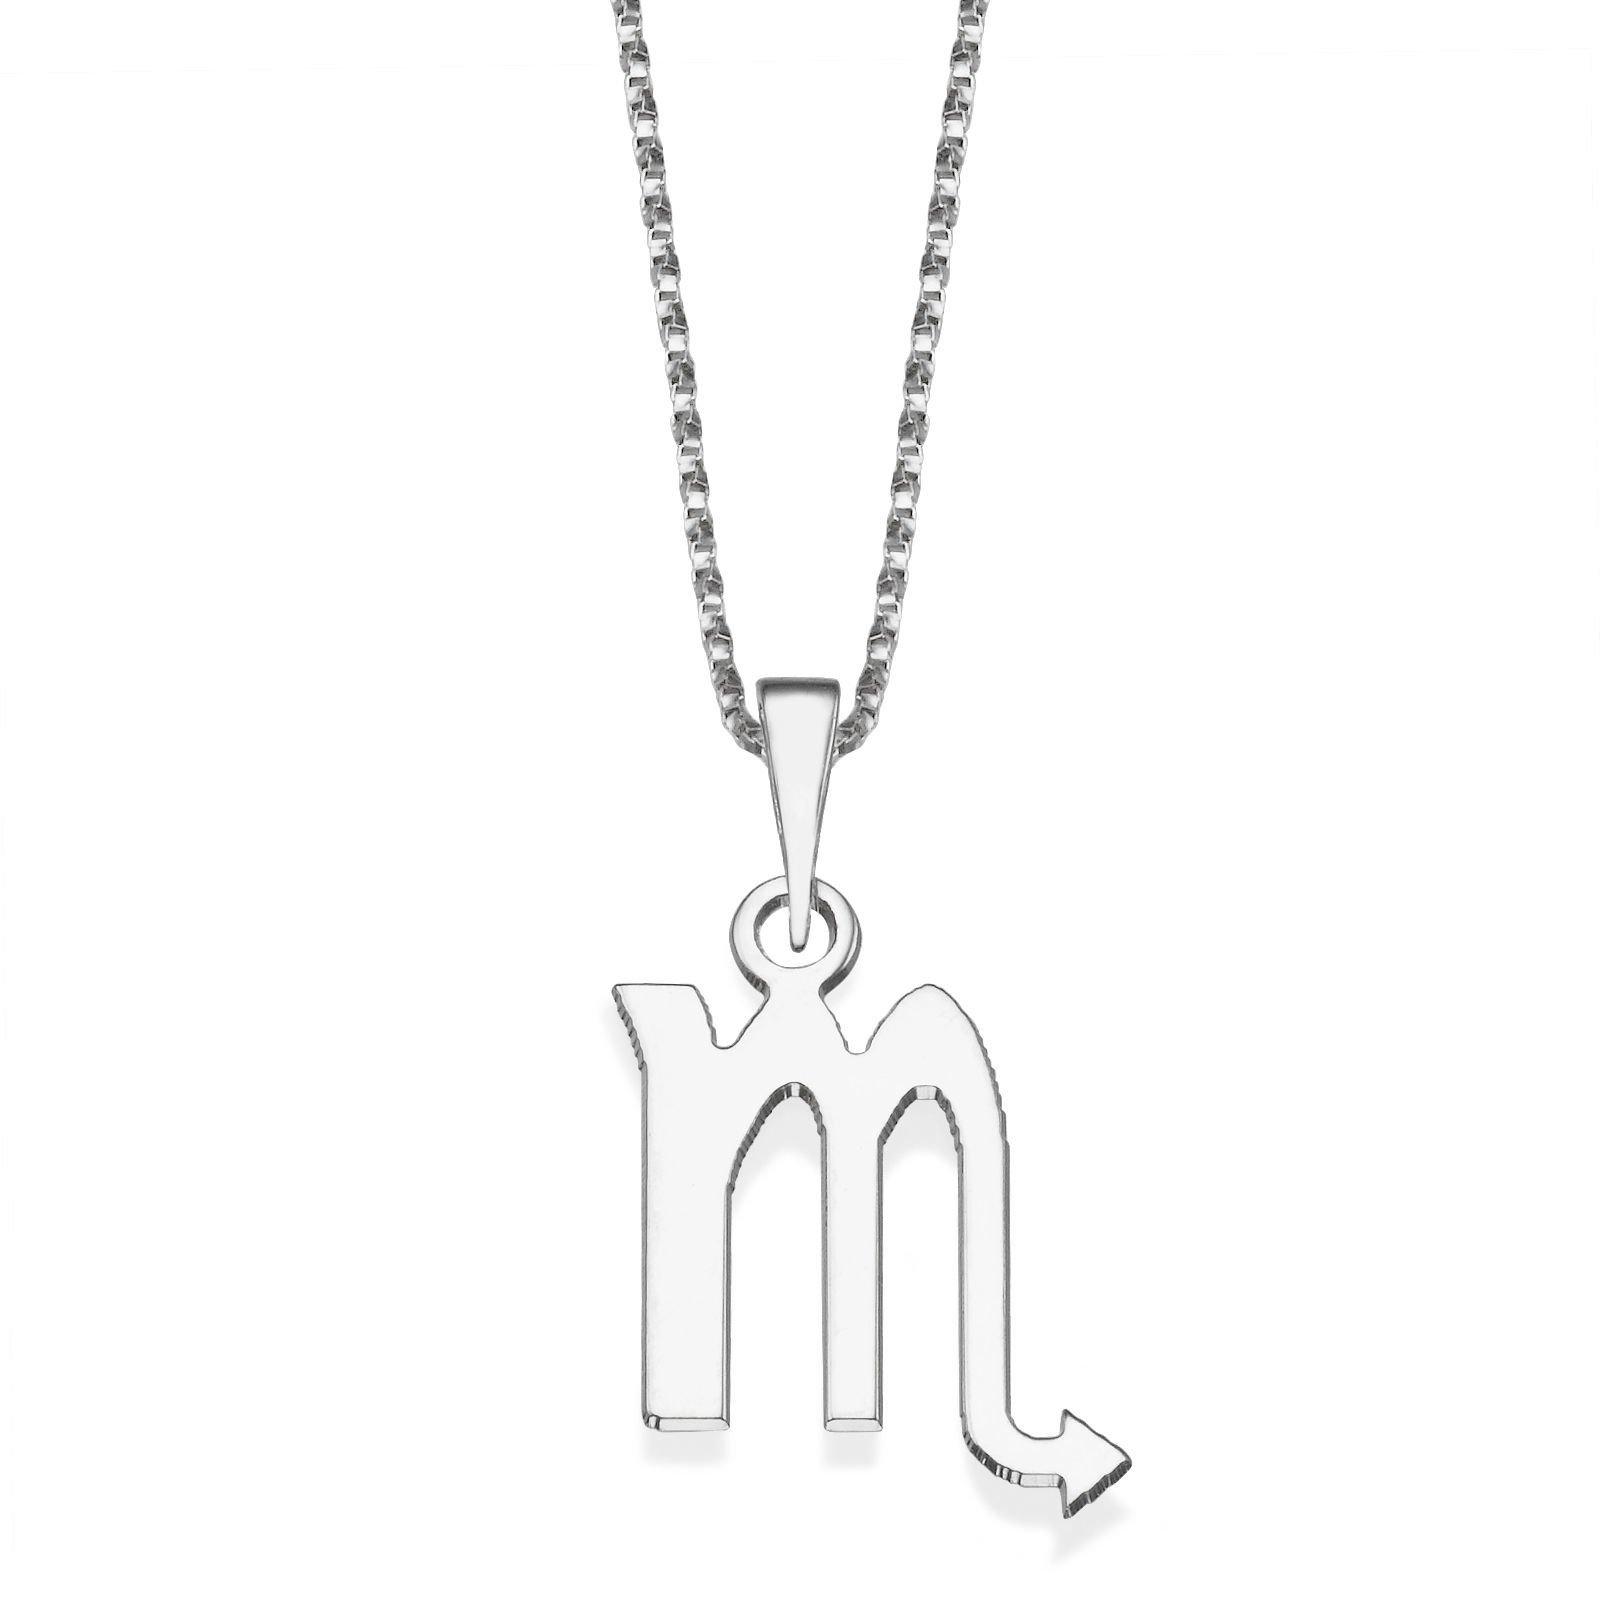 14K White Gold Scorpio Pendant With Necklace